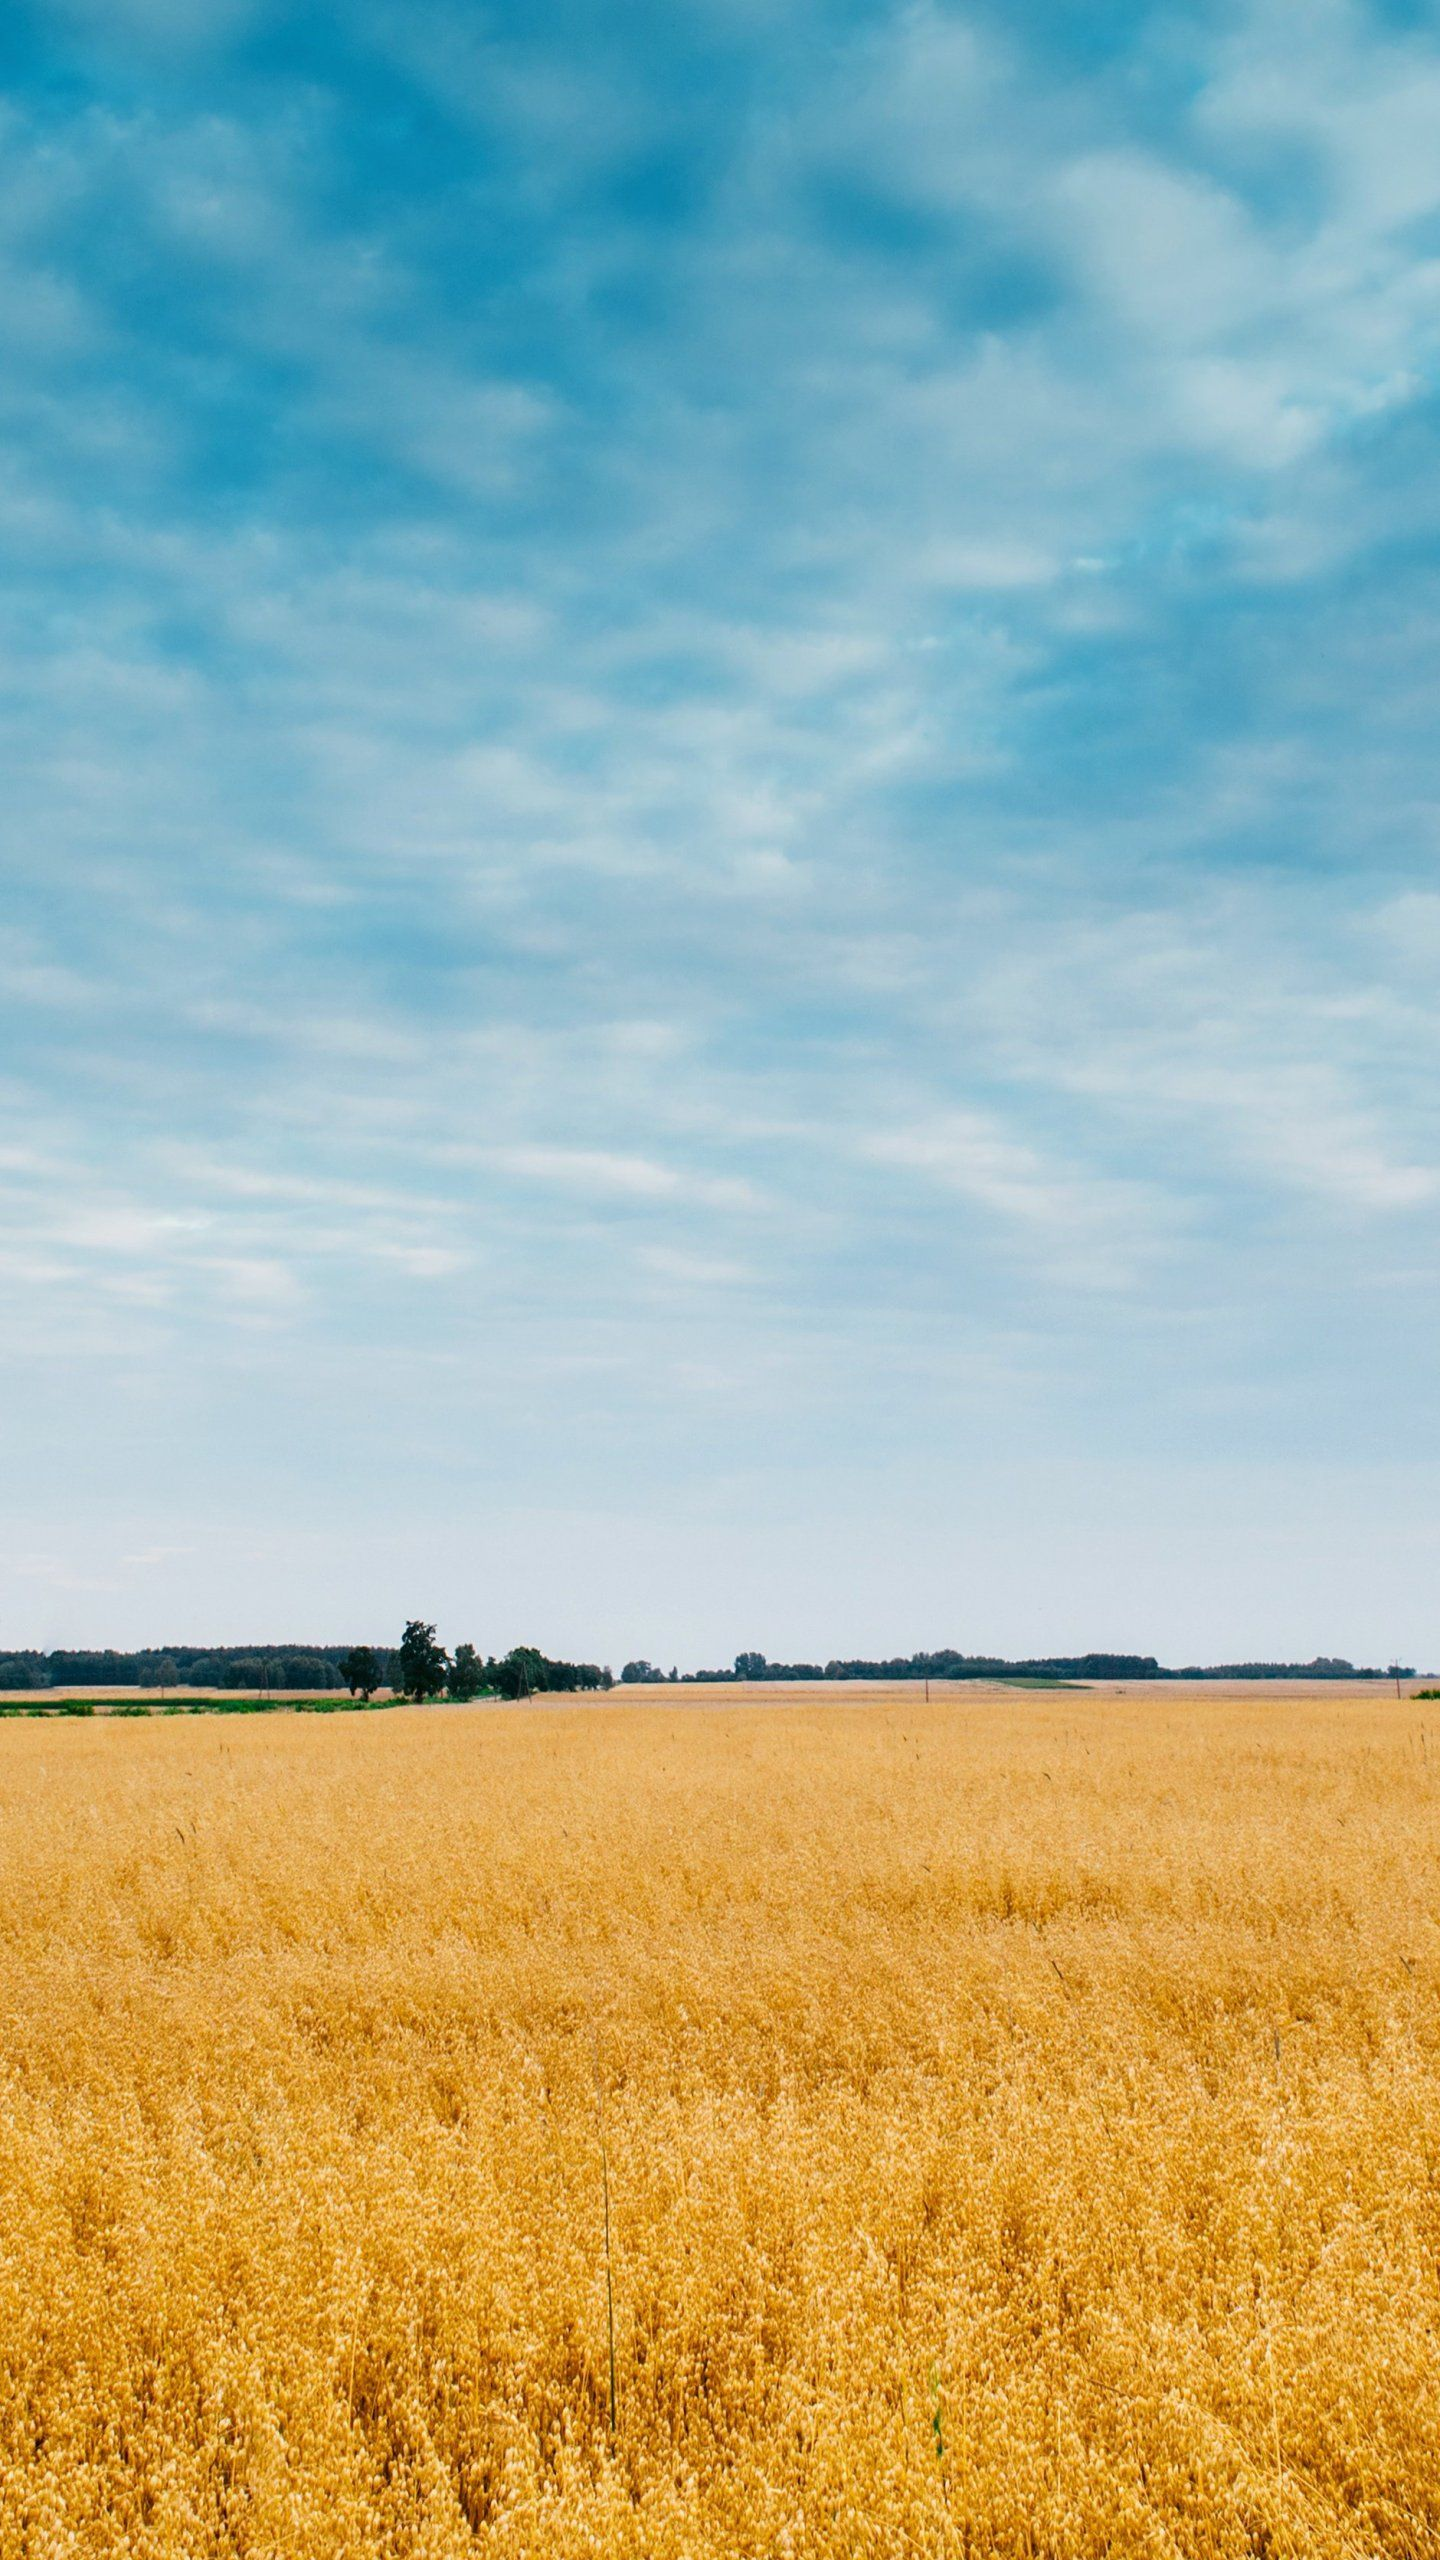 Field And Big Sky Wallpaper Iphone Android Desktop Backgrounds Iphone Wallpaper Big Sky Scenic Wallpaper